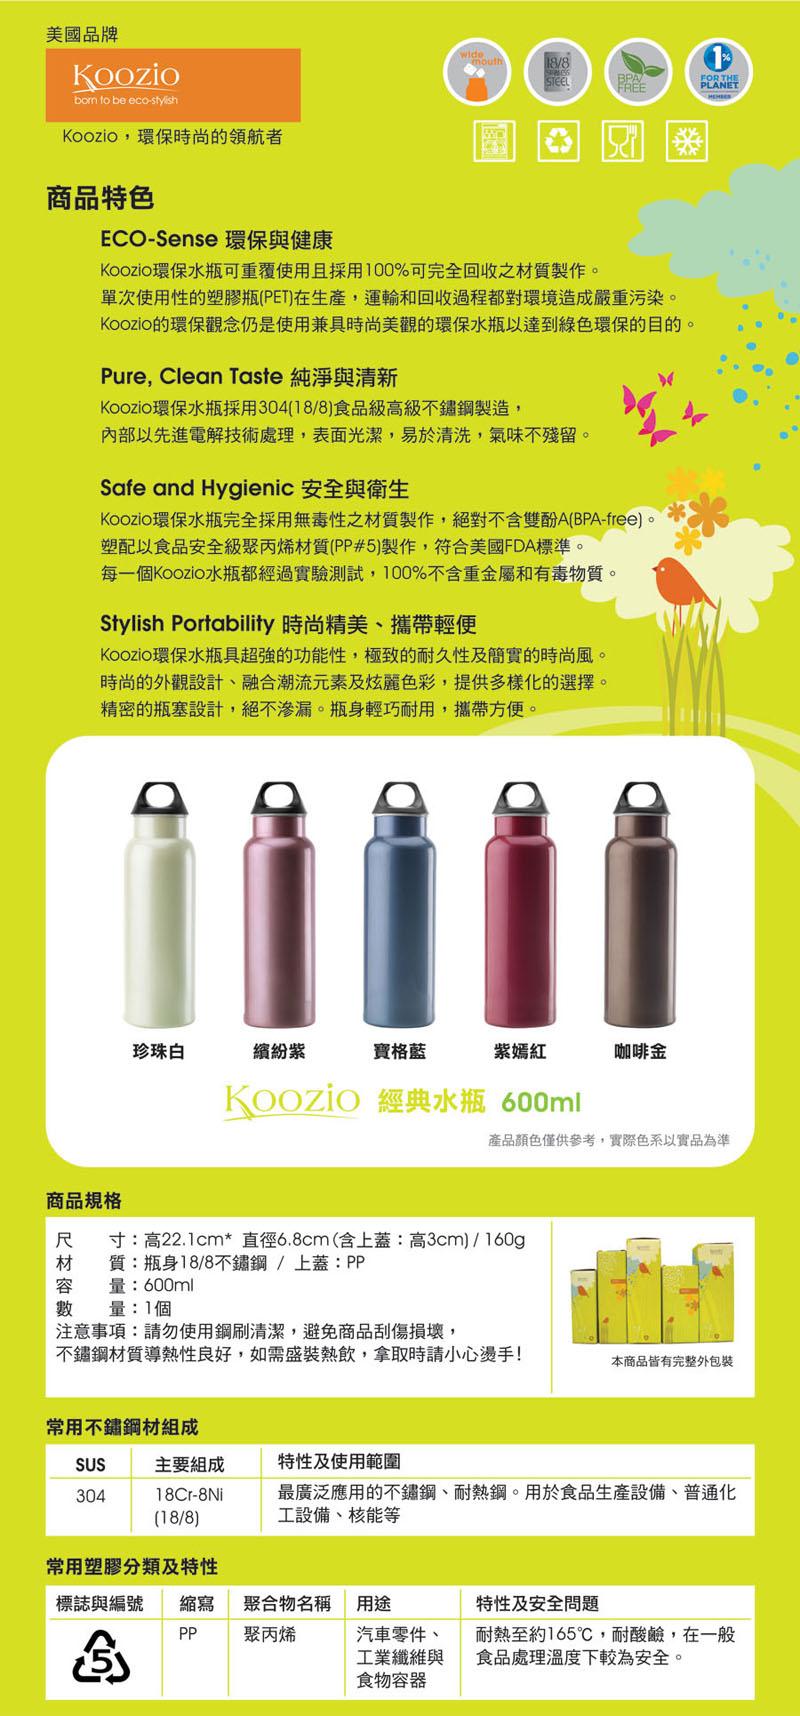 Koozio經典水瓶600ml (咖啡金) (不鏽鋼水瓶/水壺 /不銹鋼杯/ 隨手杯/ 環保杯) Koozio原廠專賣